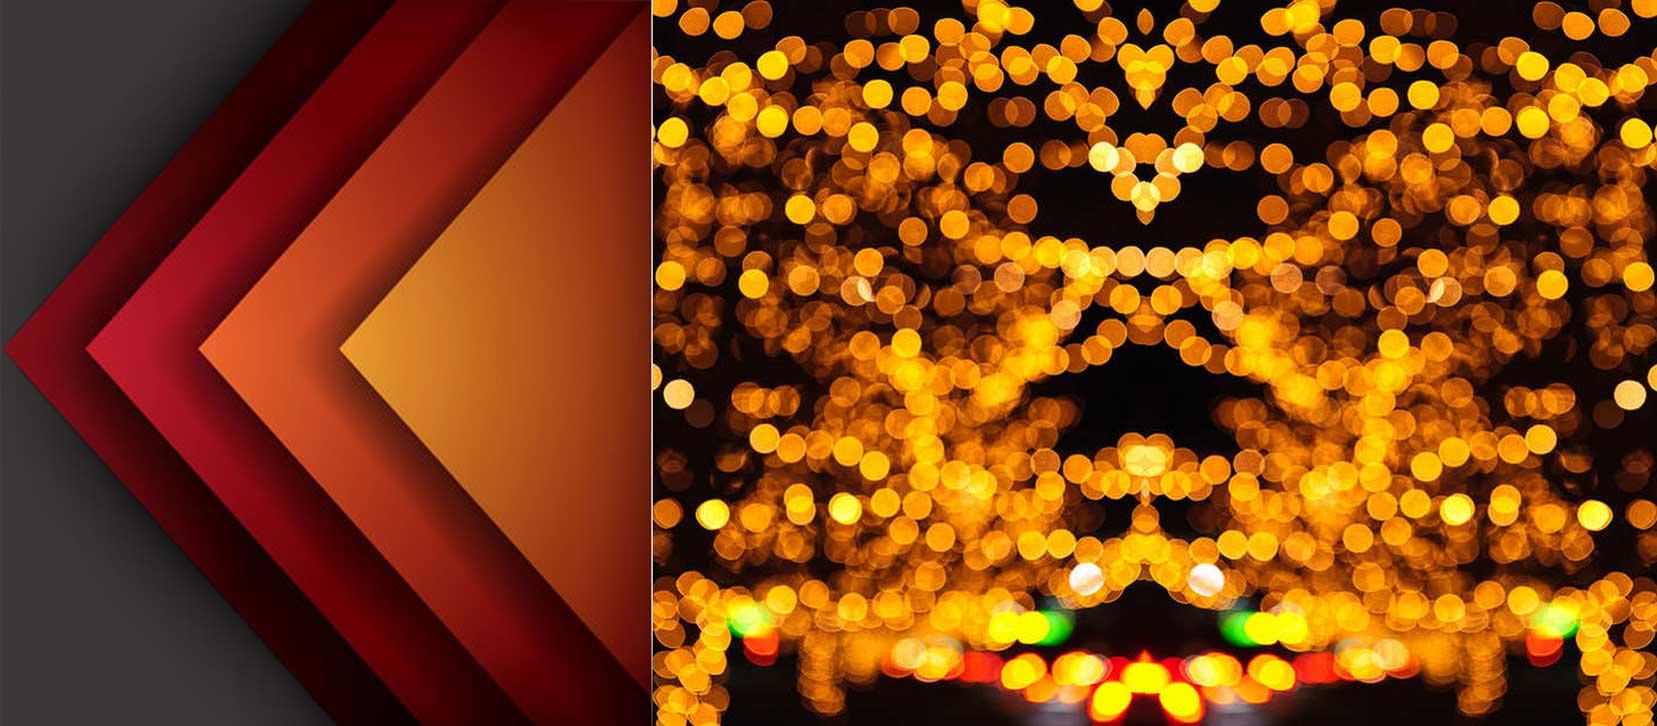 Abstract  Photography20pg - 35 ایده و راهنما برای عکاسی انتراعی